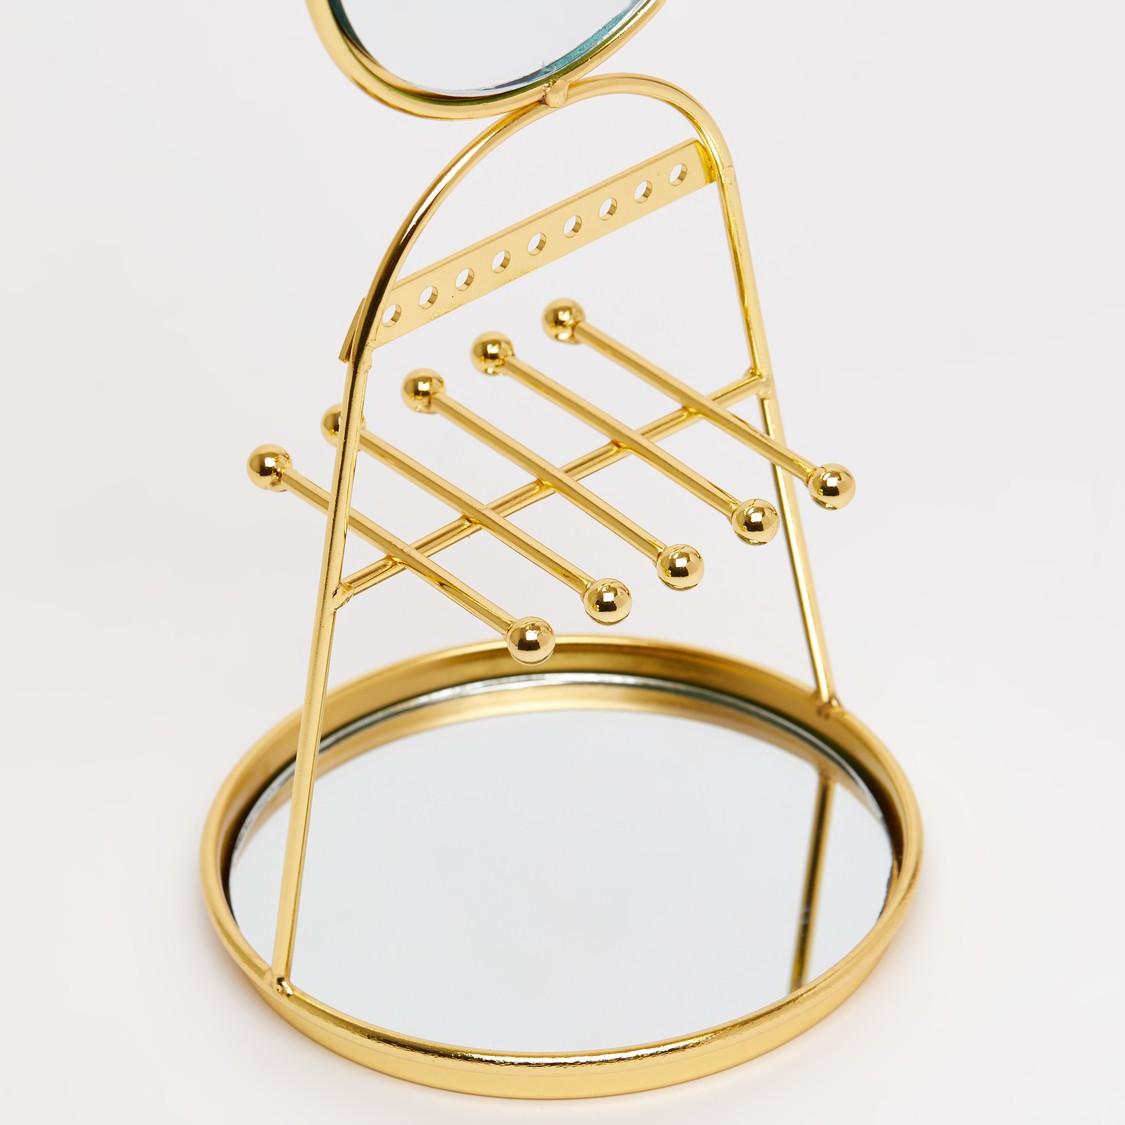 حامل مجوهرات مزيّن بمرآة